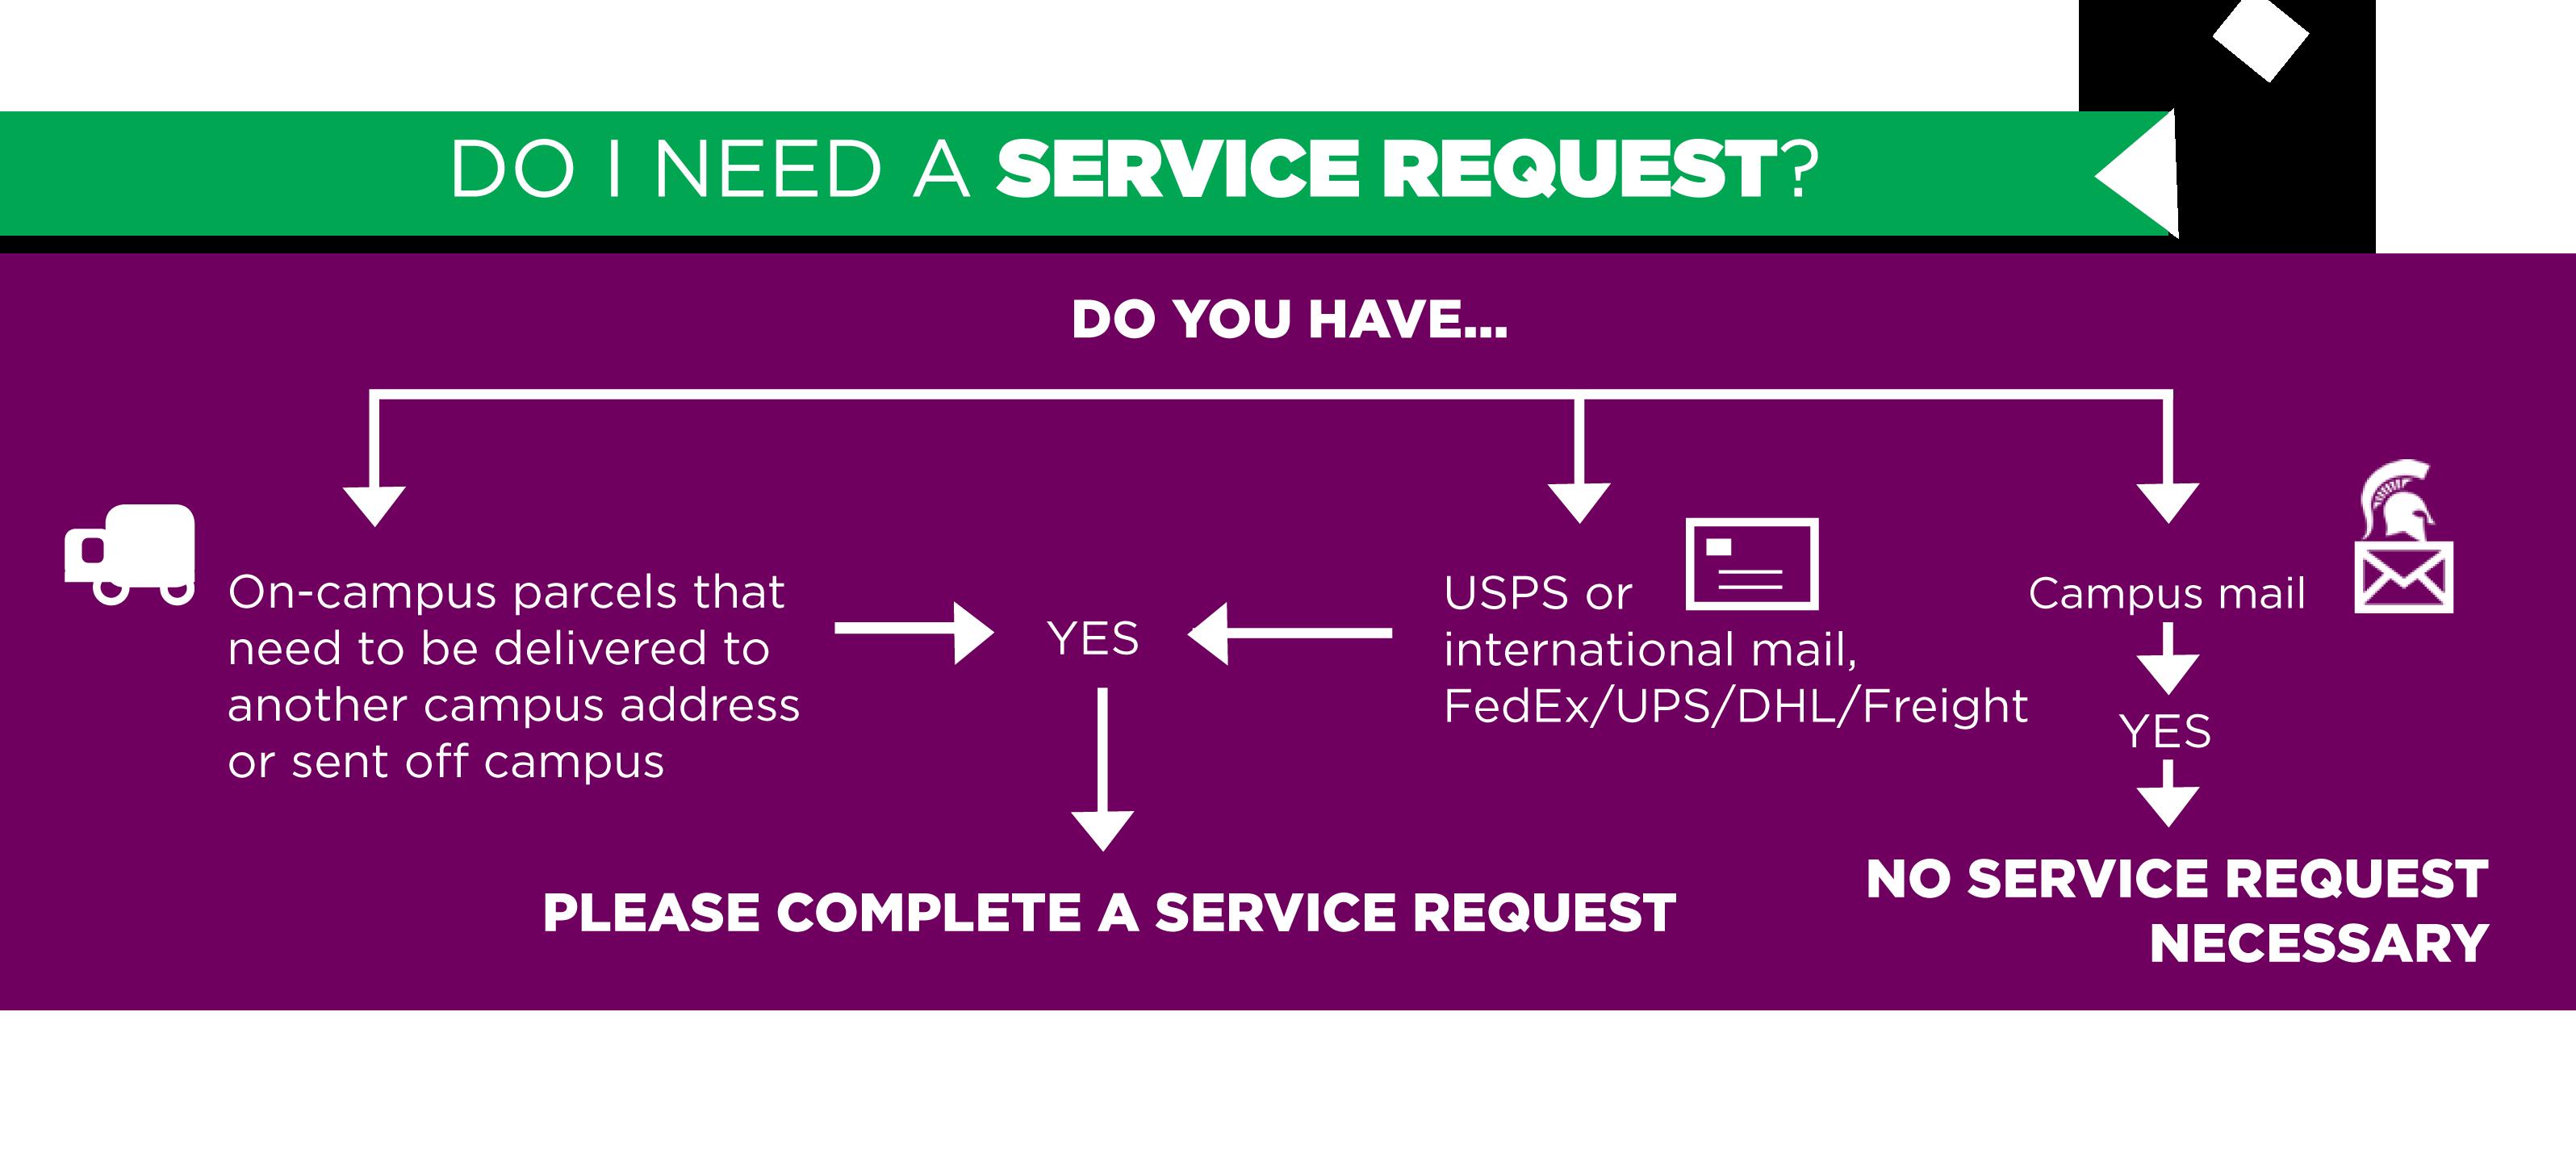 Mail Services Msu University Services